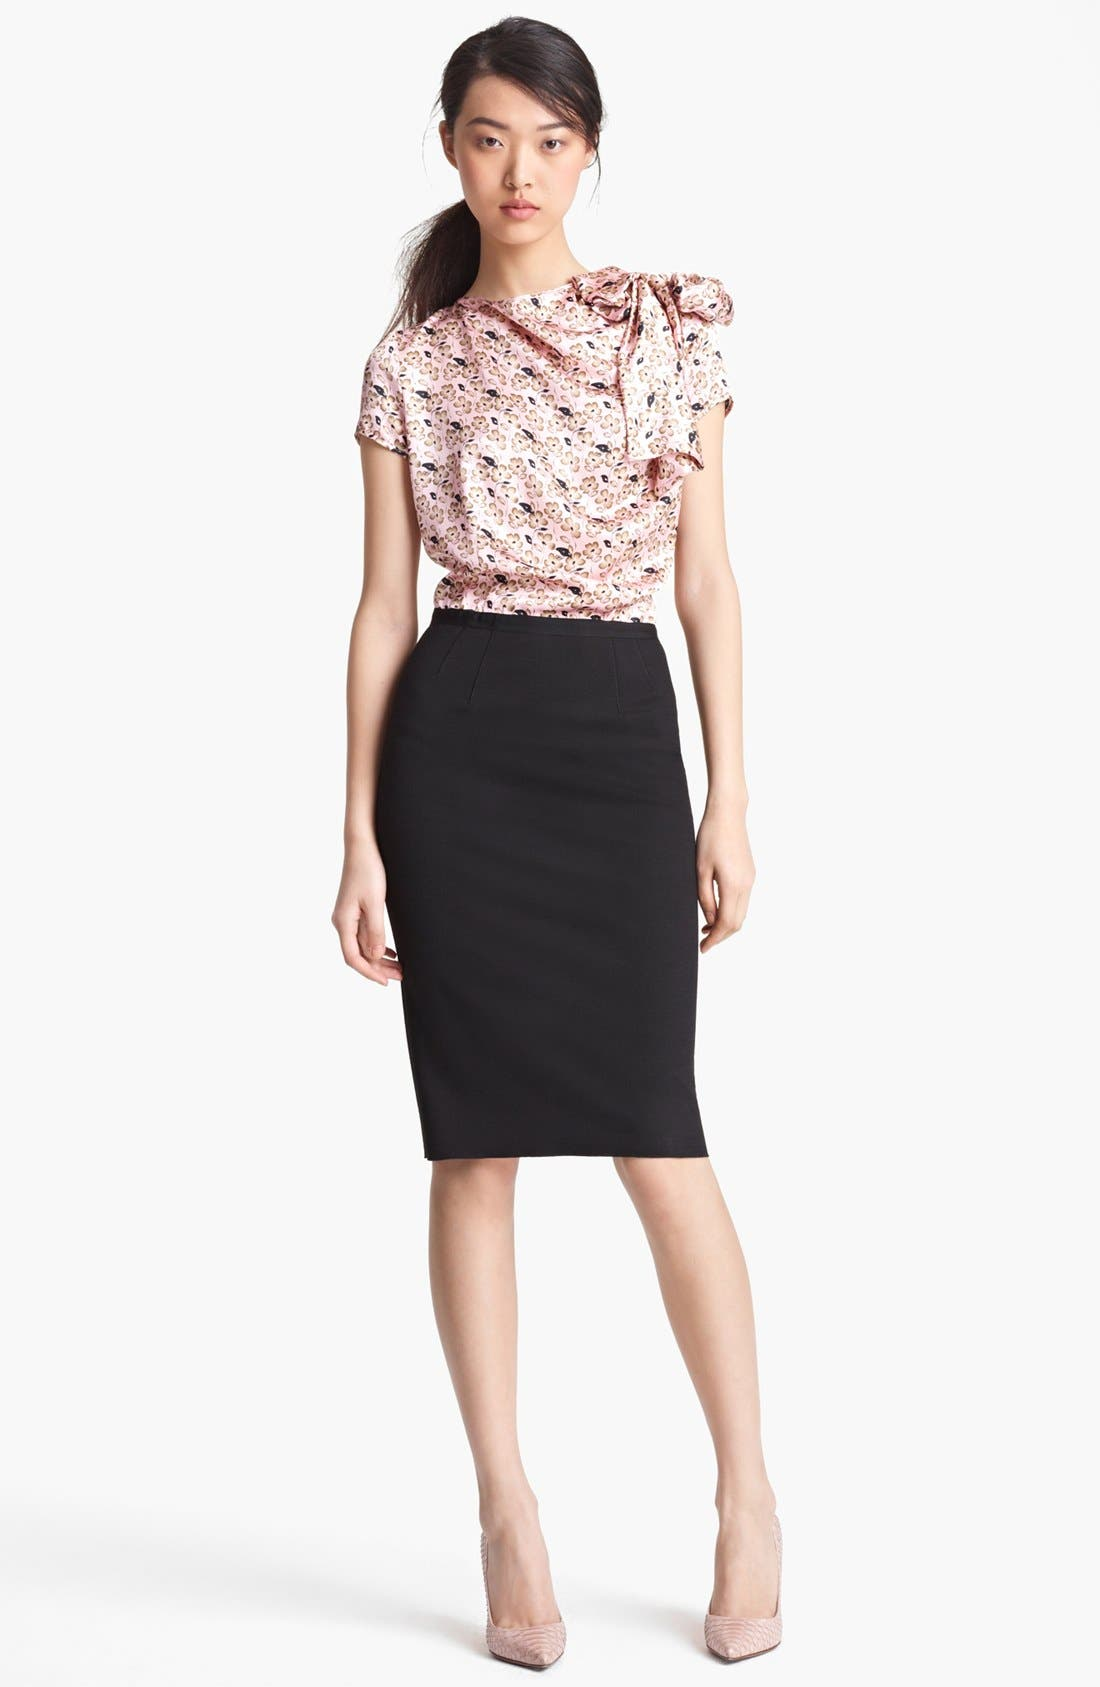 Alternate Image 1 Selected - Nina Ricci Floral Print & Jersey Dress